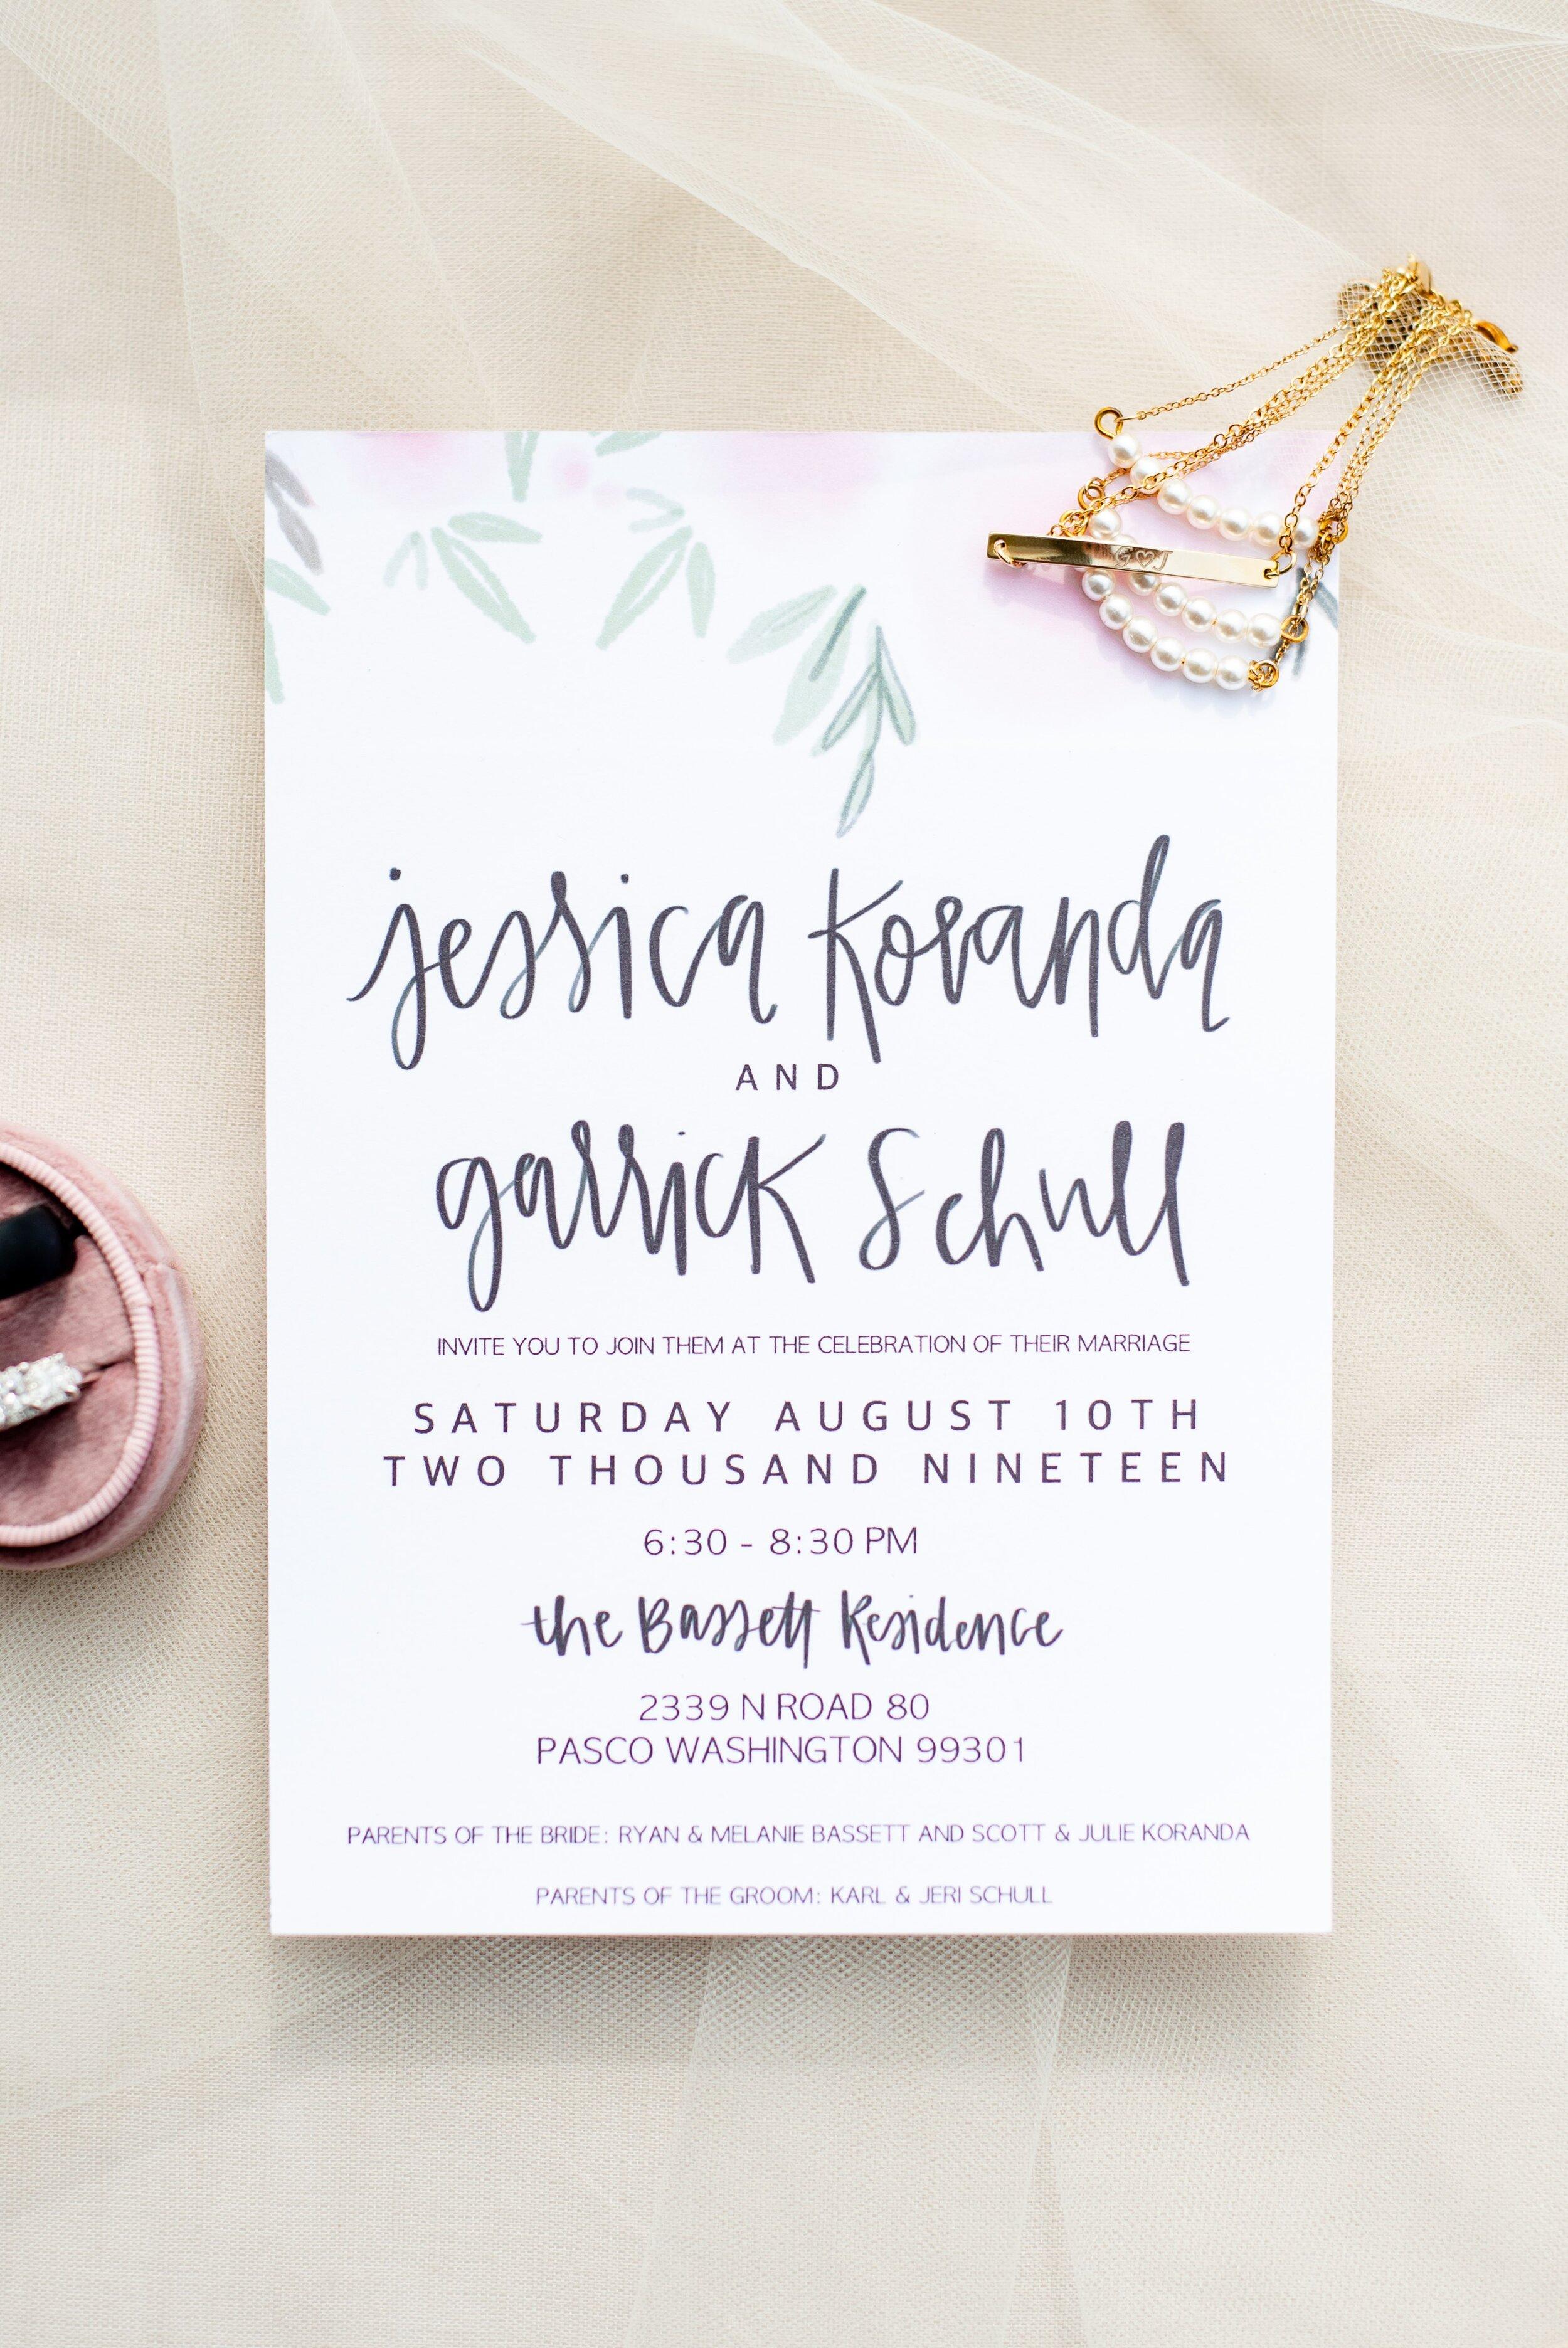 Watercolor Handwritten Wedding Invitation - Tri Cities Wedding Photographer - Morgan Tayler Photo & Design - Tri Cities Washington Backyard Wedding